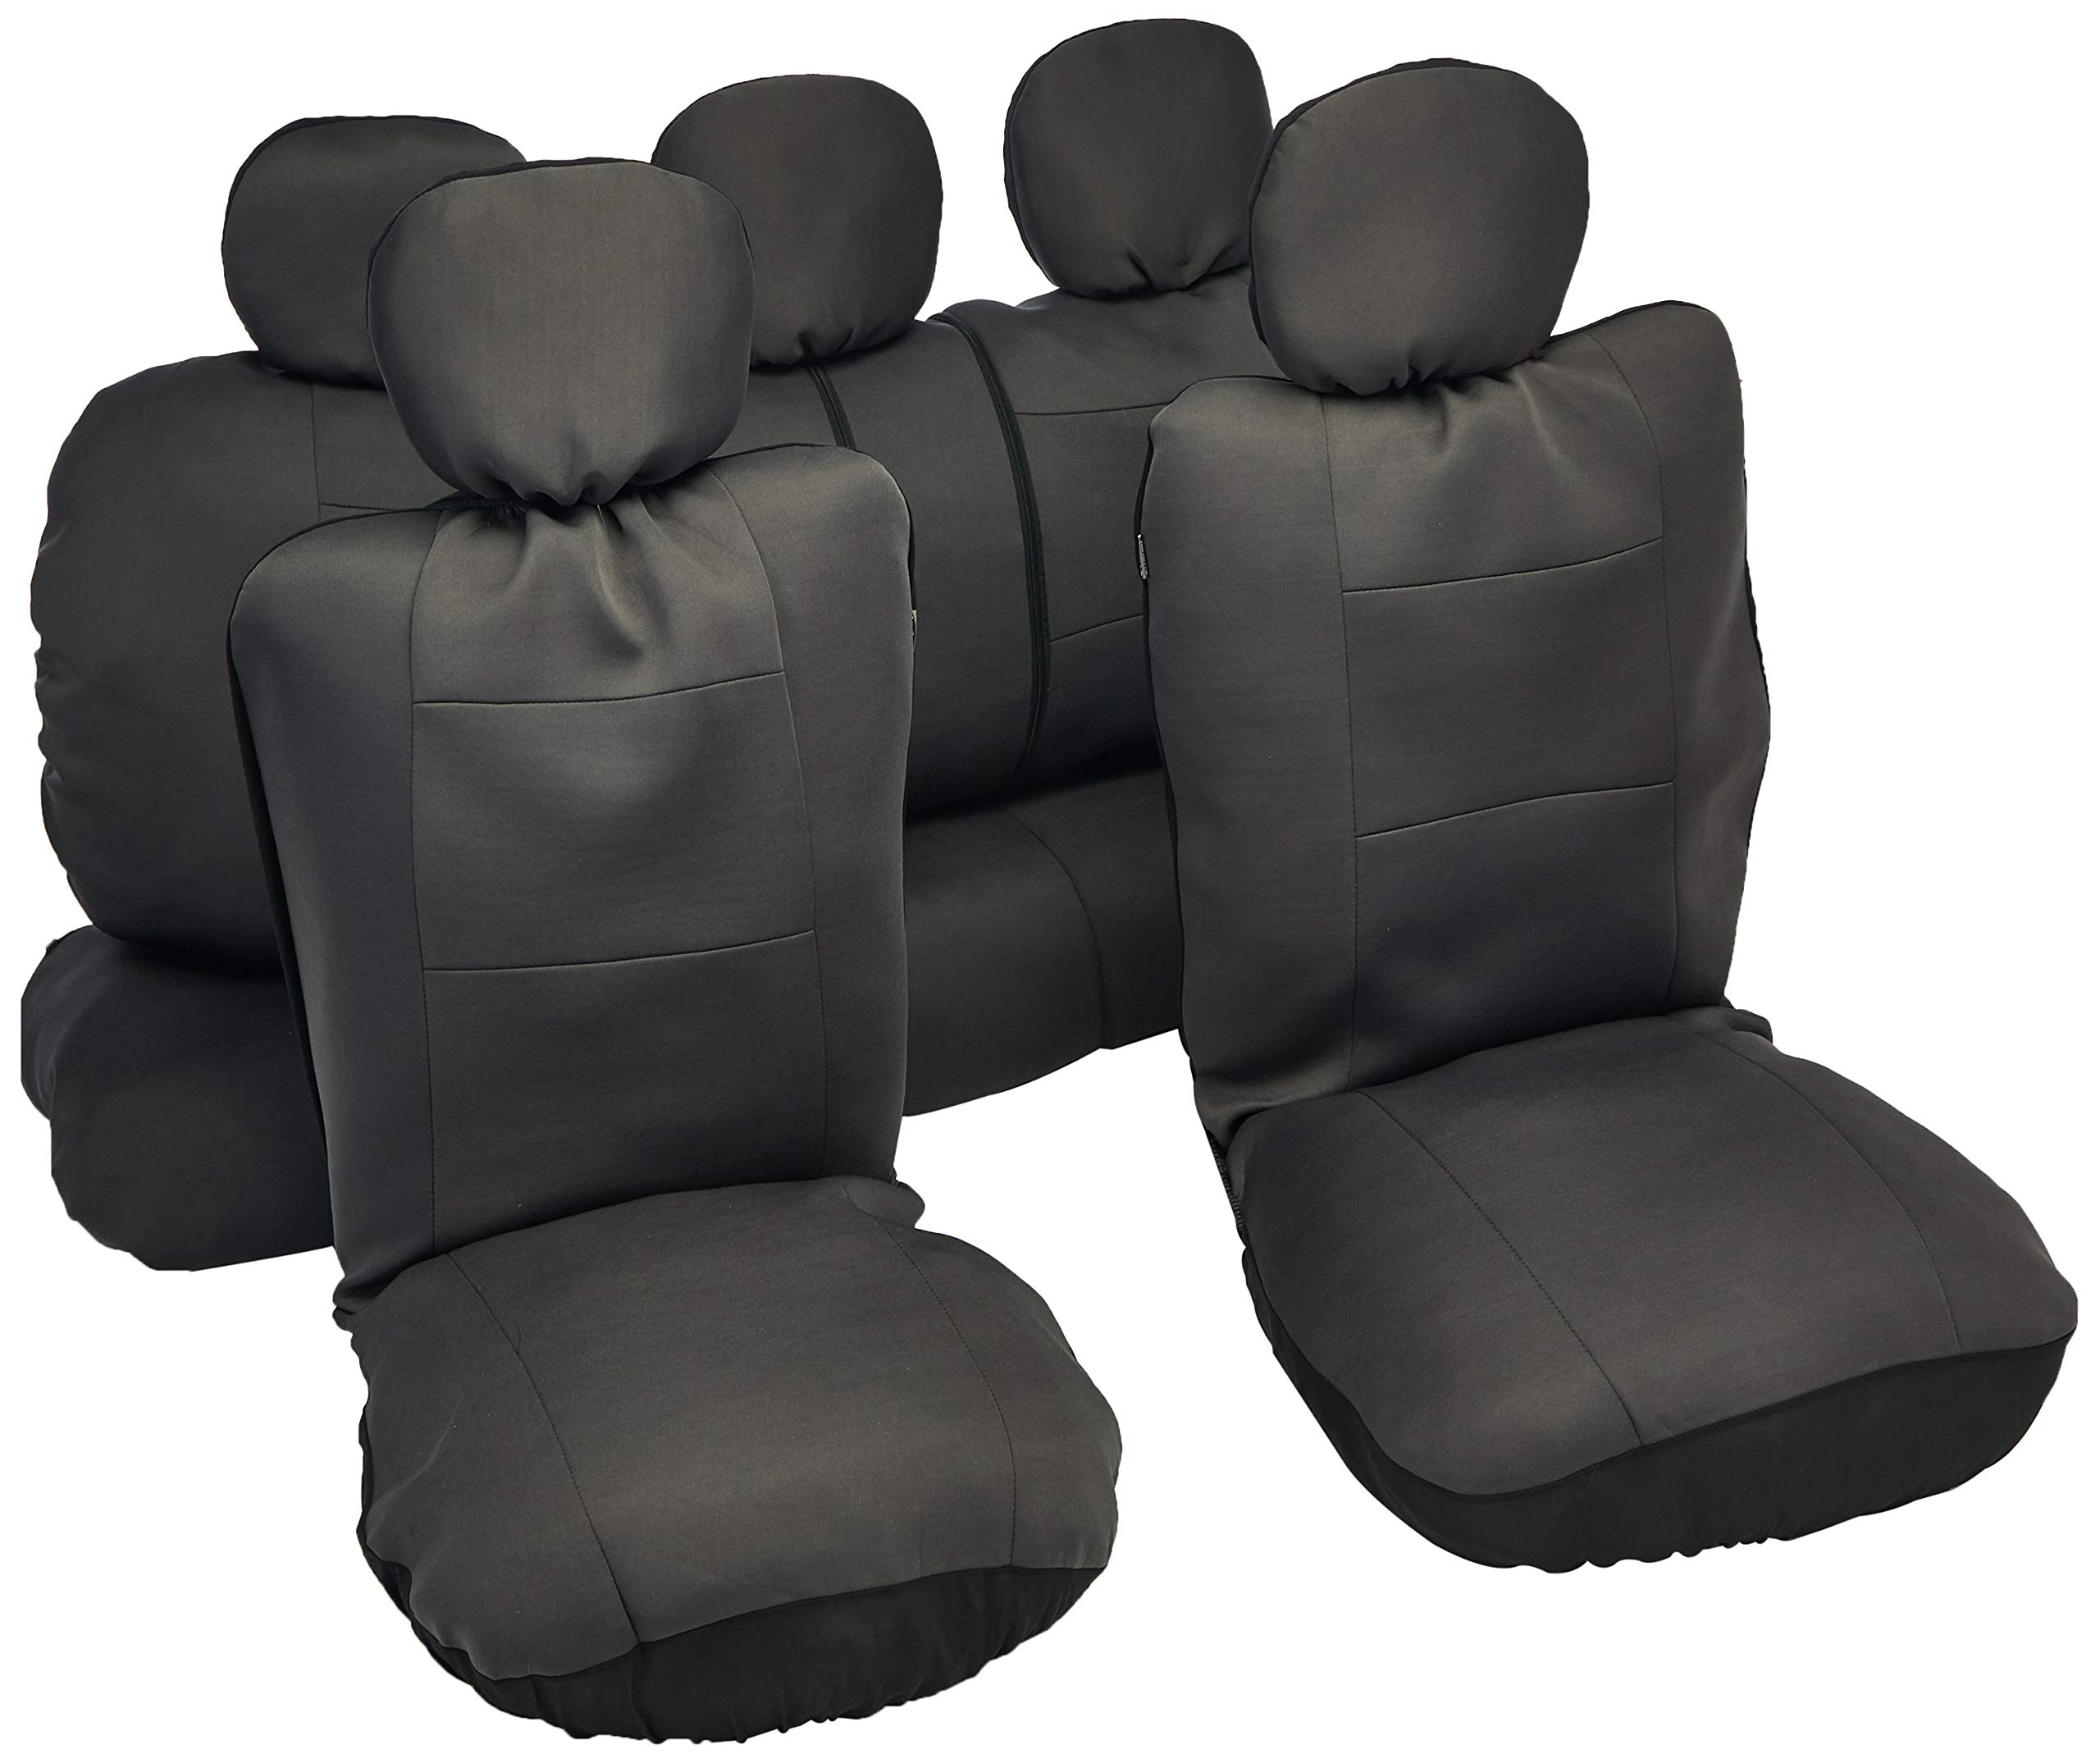 BDK Charcoal Black Car Seat Covers Full 9pc Set - Sleek & Stylish - Split Option Bench 5 Headrests Front & Rear Bench - OS-309-AC by BDK